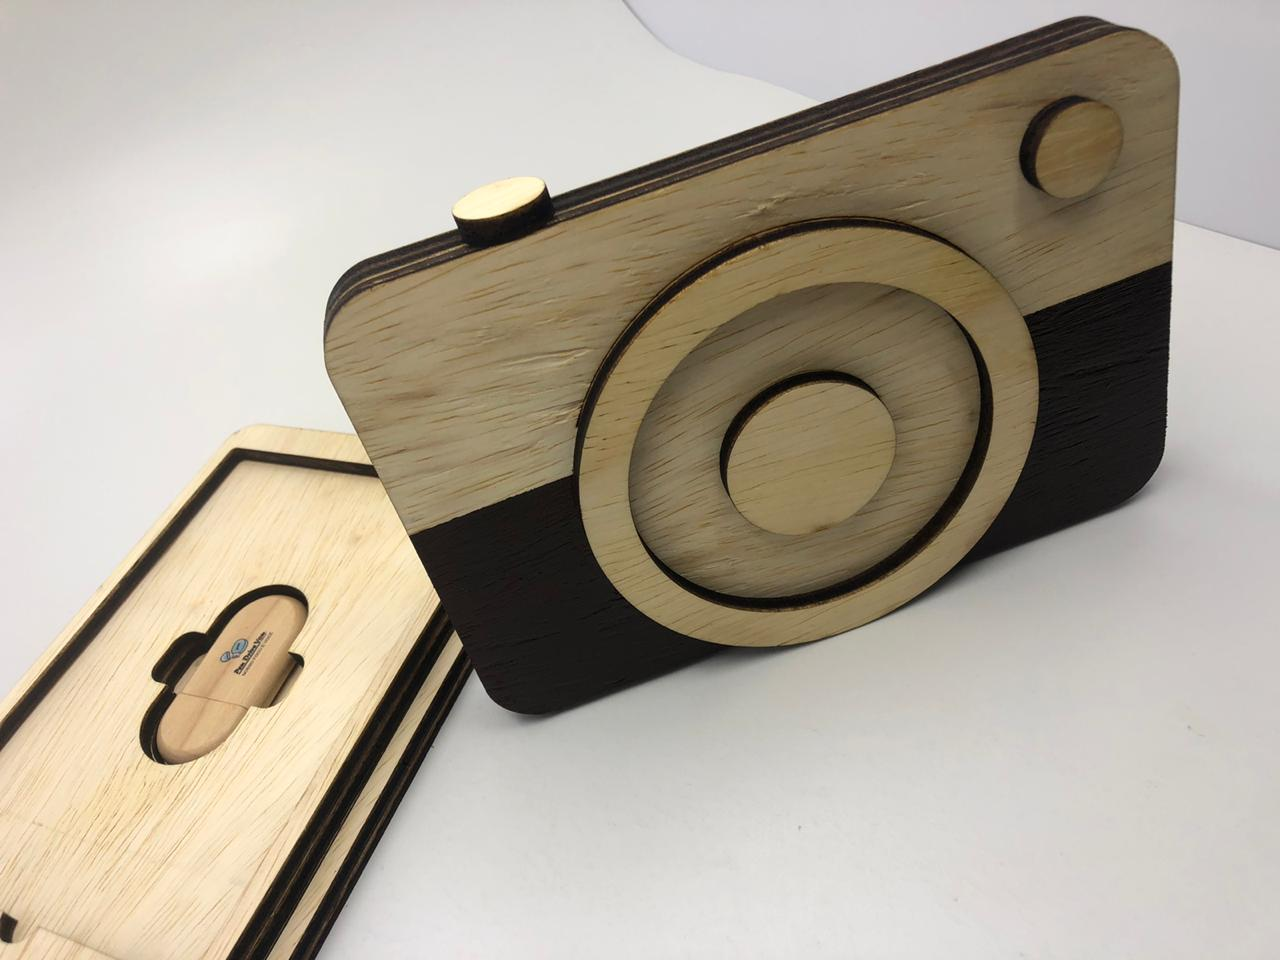 Kit Case Wood  Câm p/ foto 10x15 + Pen Drive Madeira Oval   - Pen Drive You